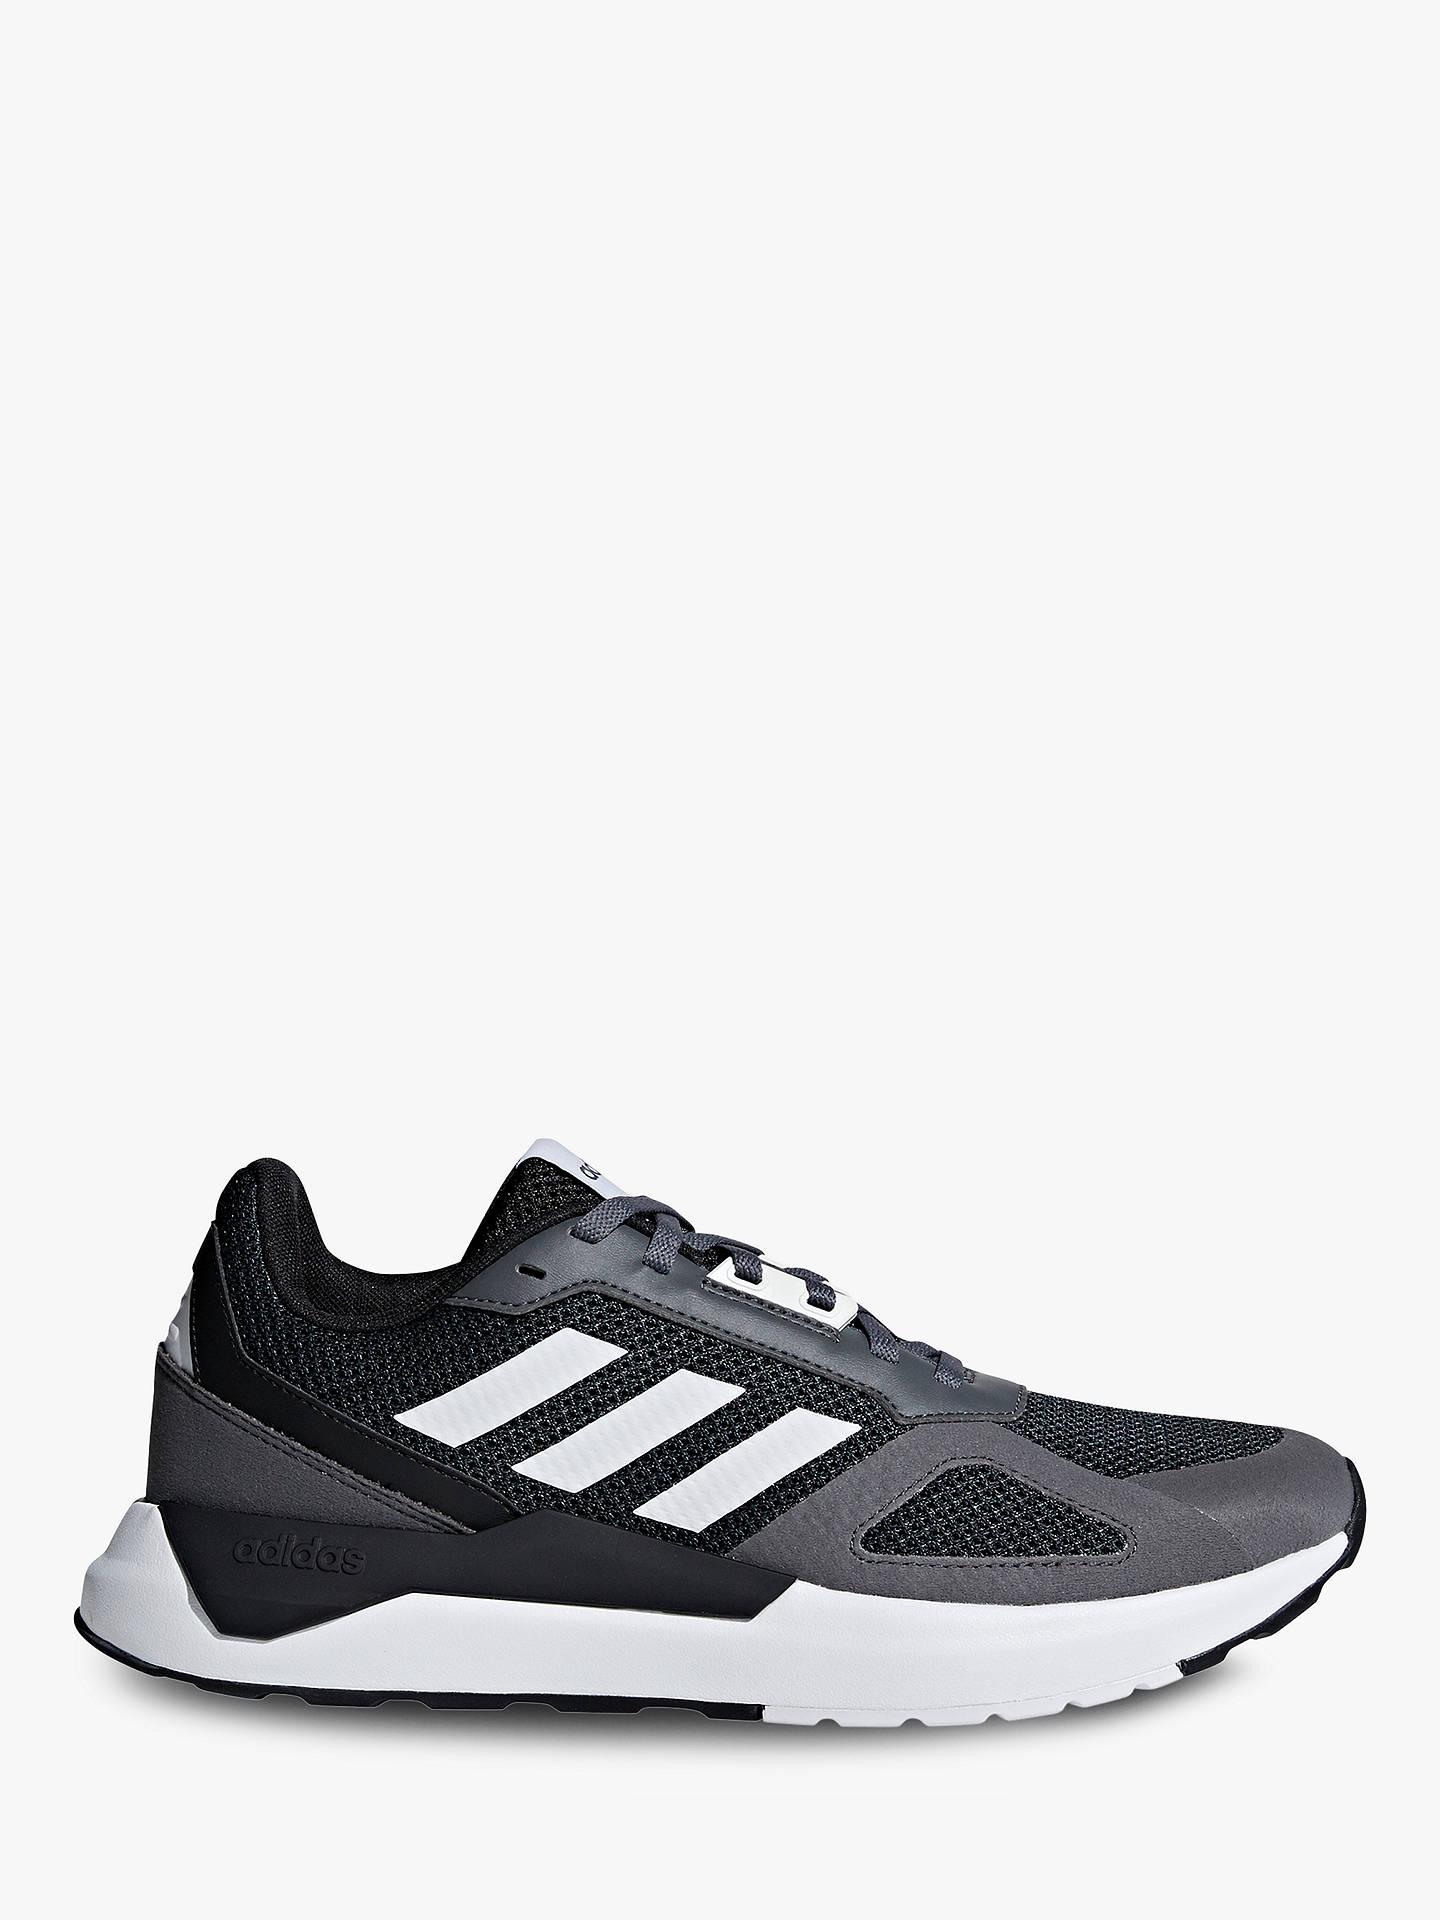 premium selection 7f517 692d3 adidas Men's Run 80s Trainers at John Lewis & Partners